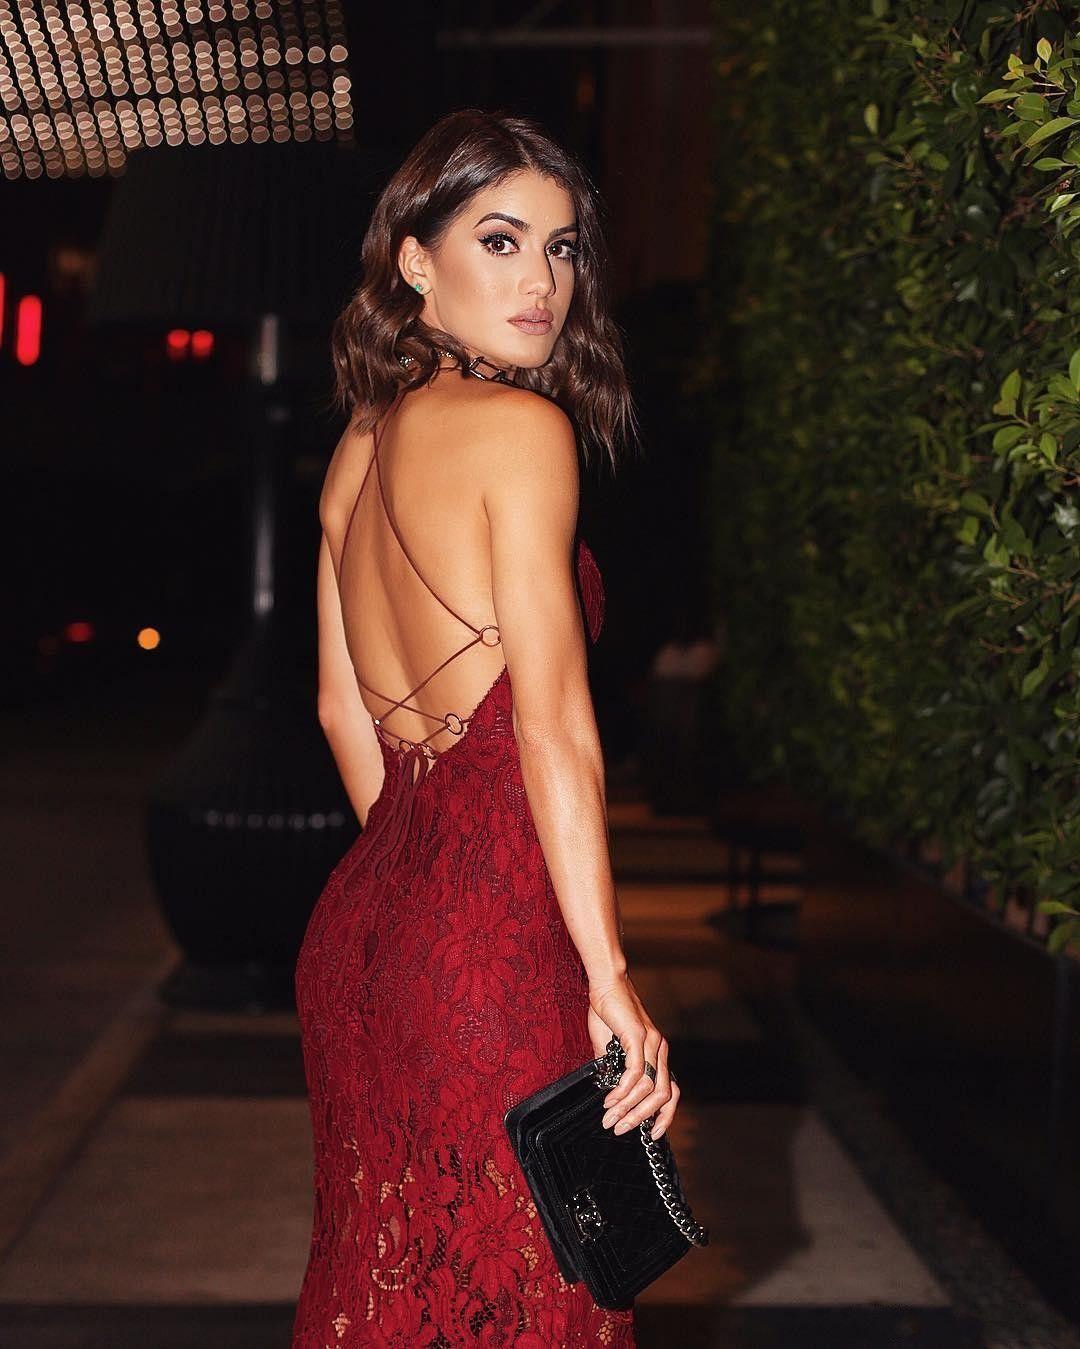 Sexy Lace Burgundy Cocktail Dresses Spaghetti Straps Back Criss Cross Straps Party Dress Evening Wear Short Split Prom Dress